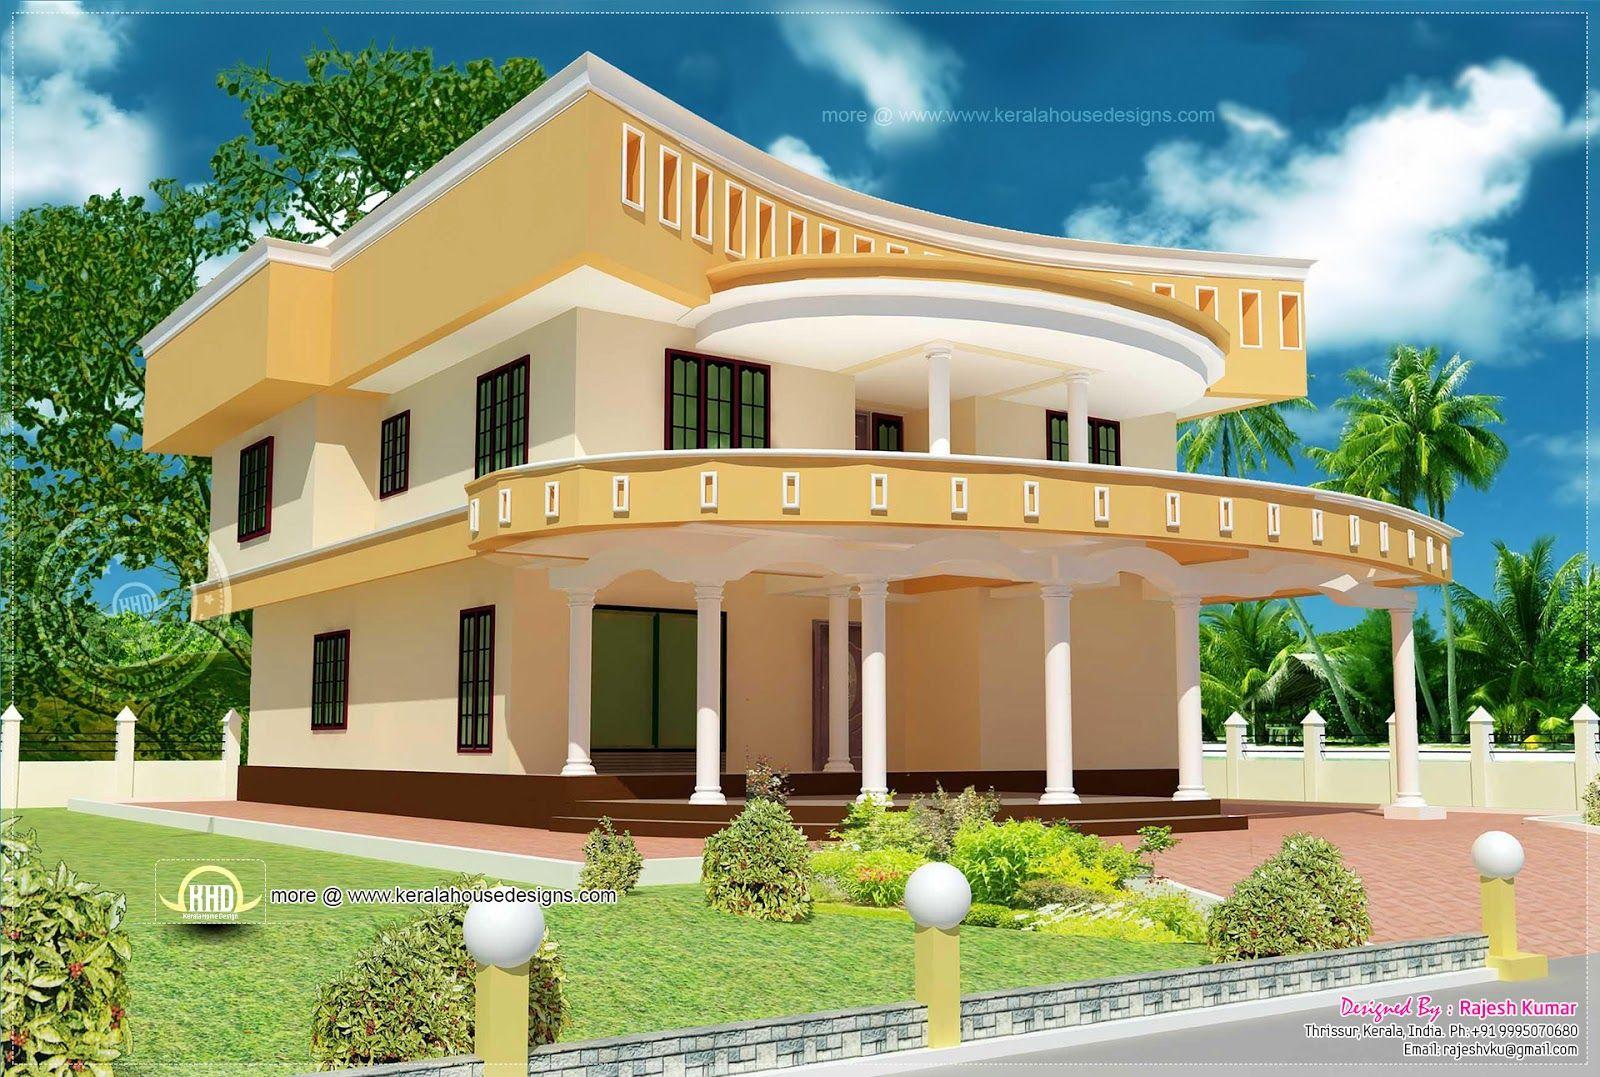 Unique Home Design In Kerala Kerala Home Design And Floor Plans